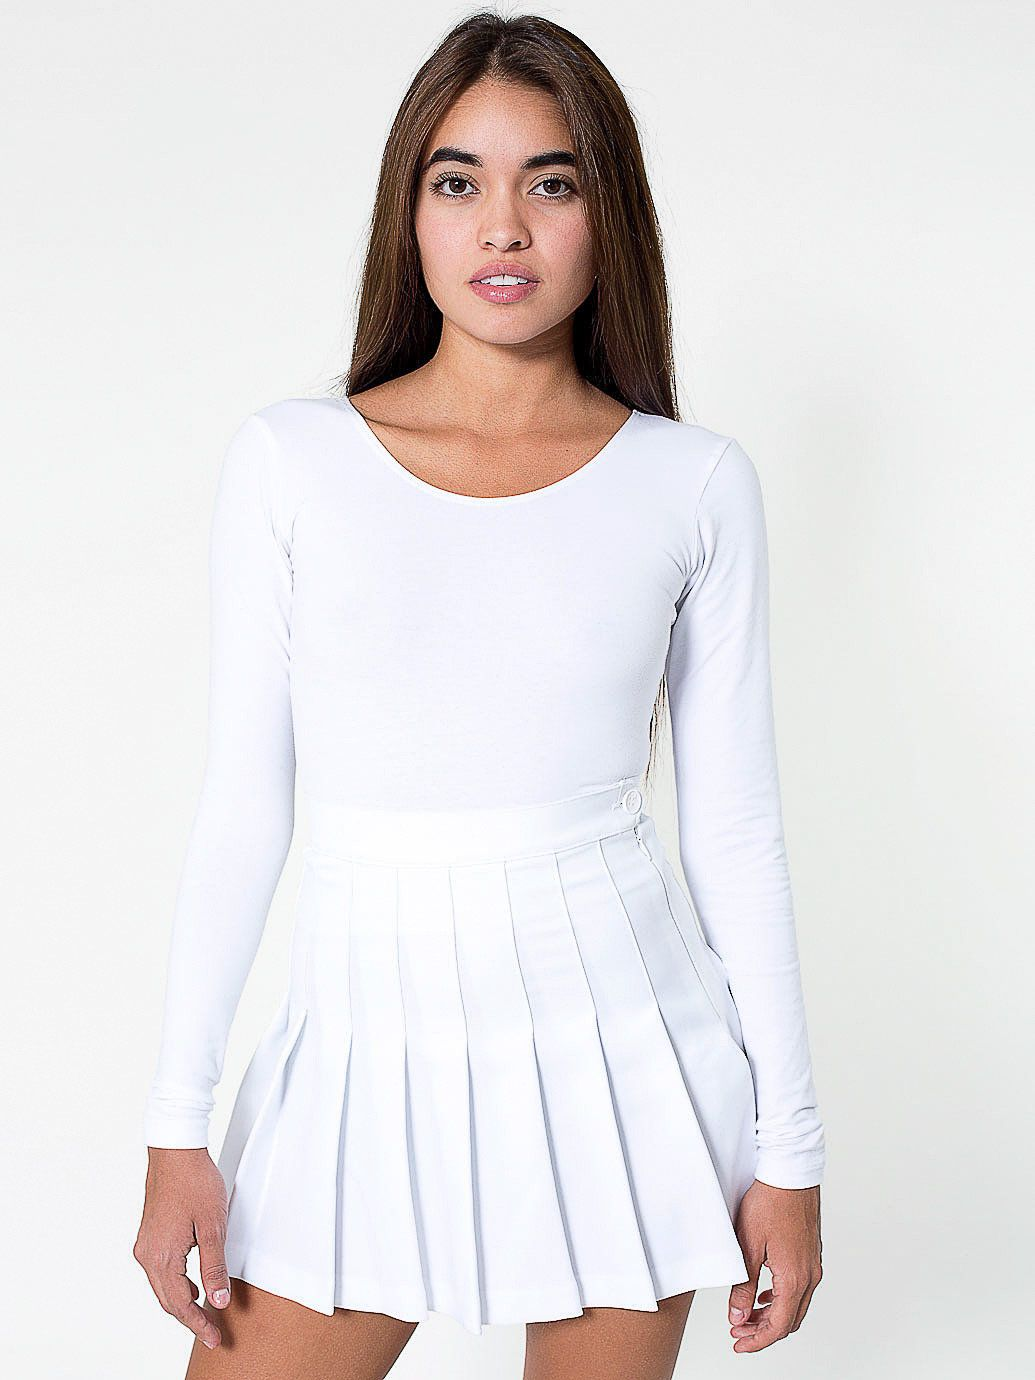 Tennis Skirt American Apparel American Apparel Tennis Skirt Fashion Hot Fashion [ 1380 x 1035 Pixel ]